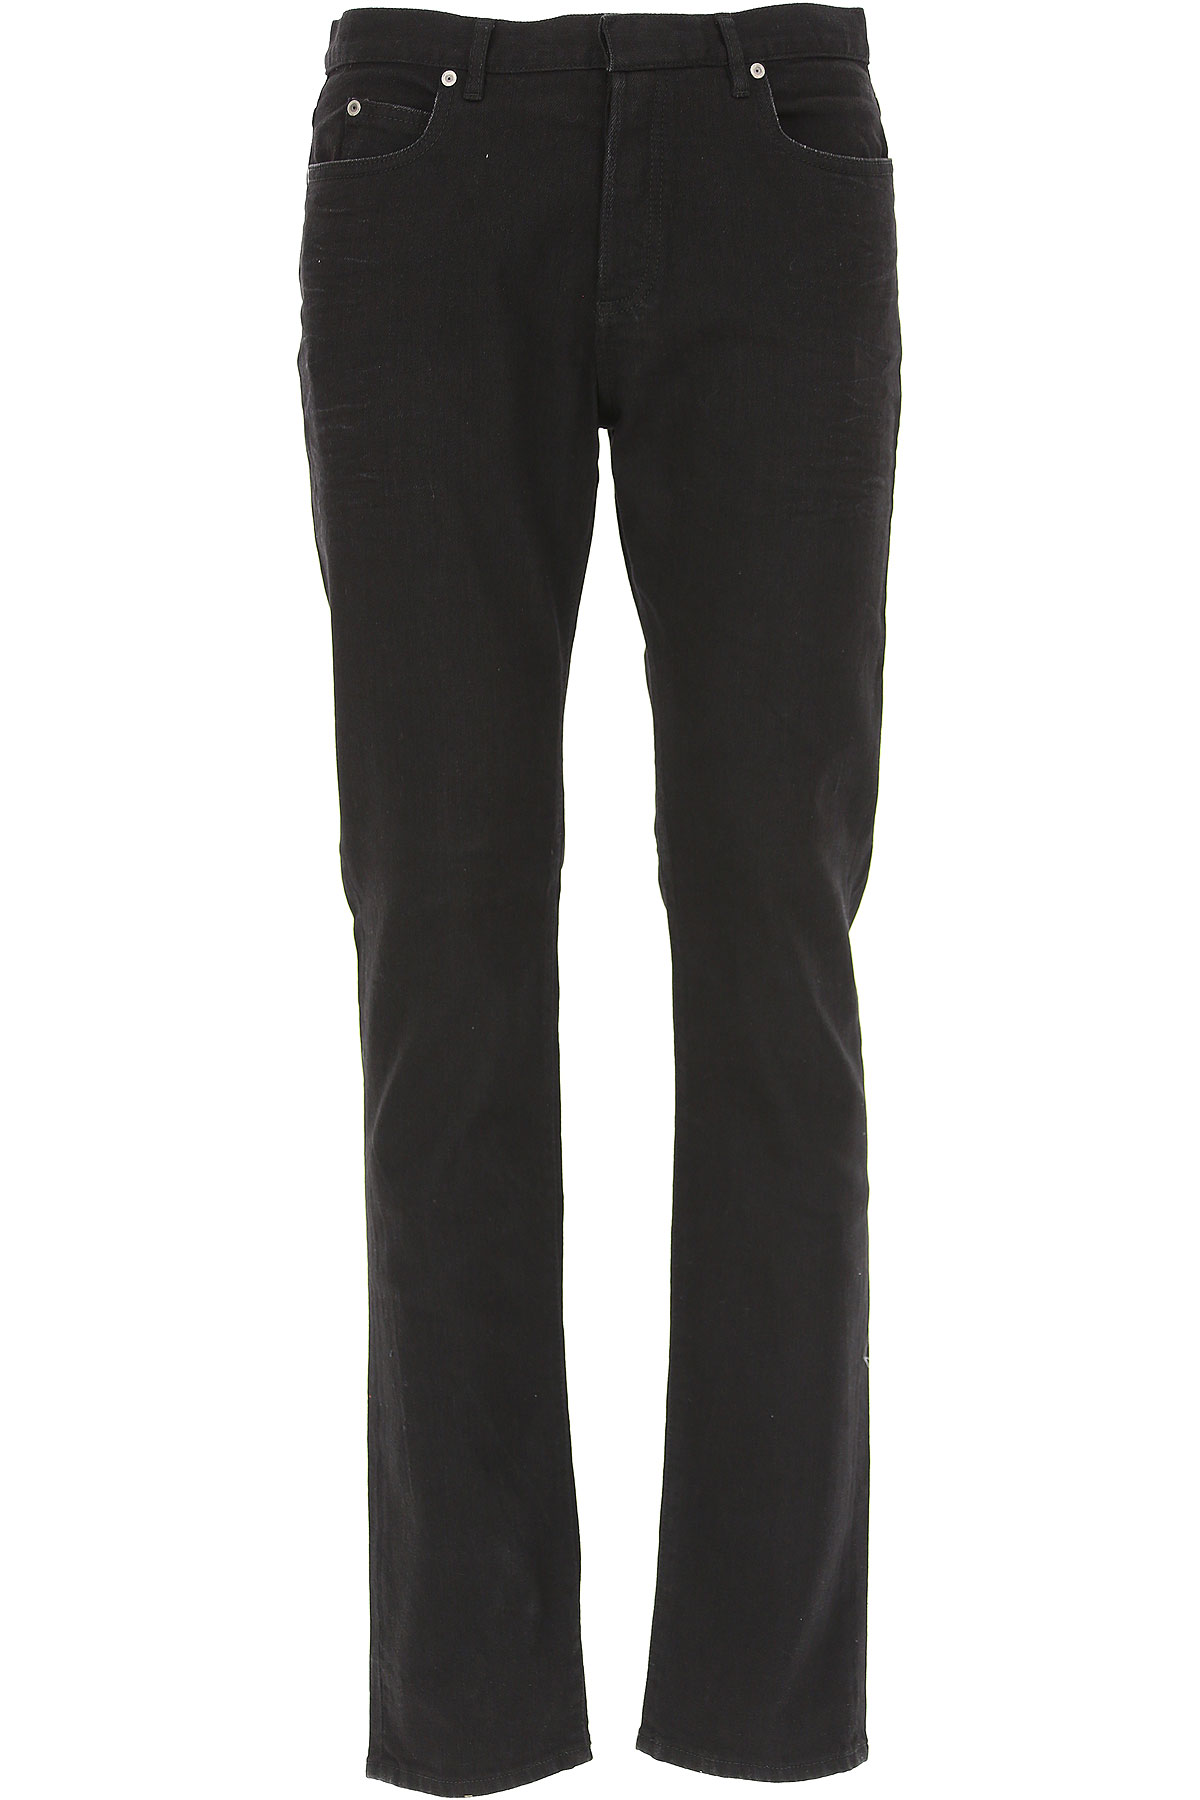 Maison Martin Margiela Jeans On Sale in Outlet, Black, Cotton, 2017, 29 33 34